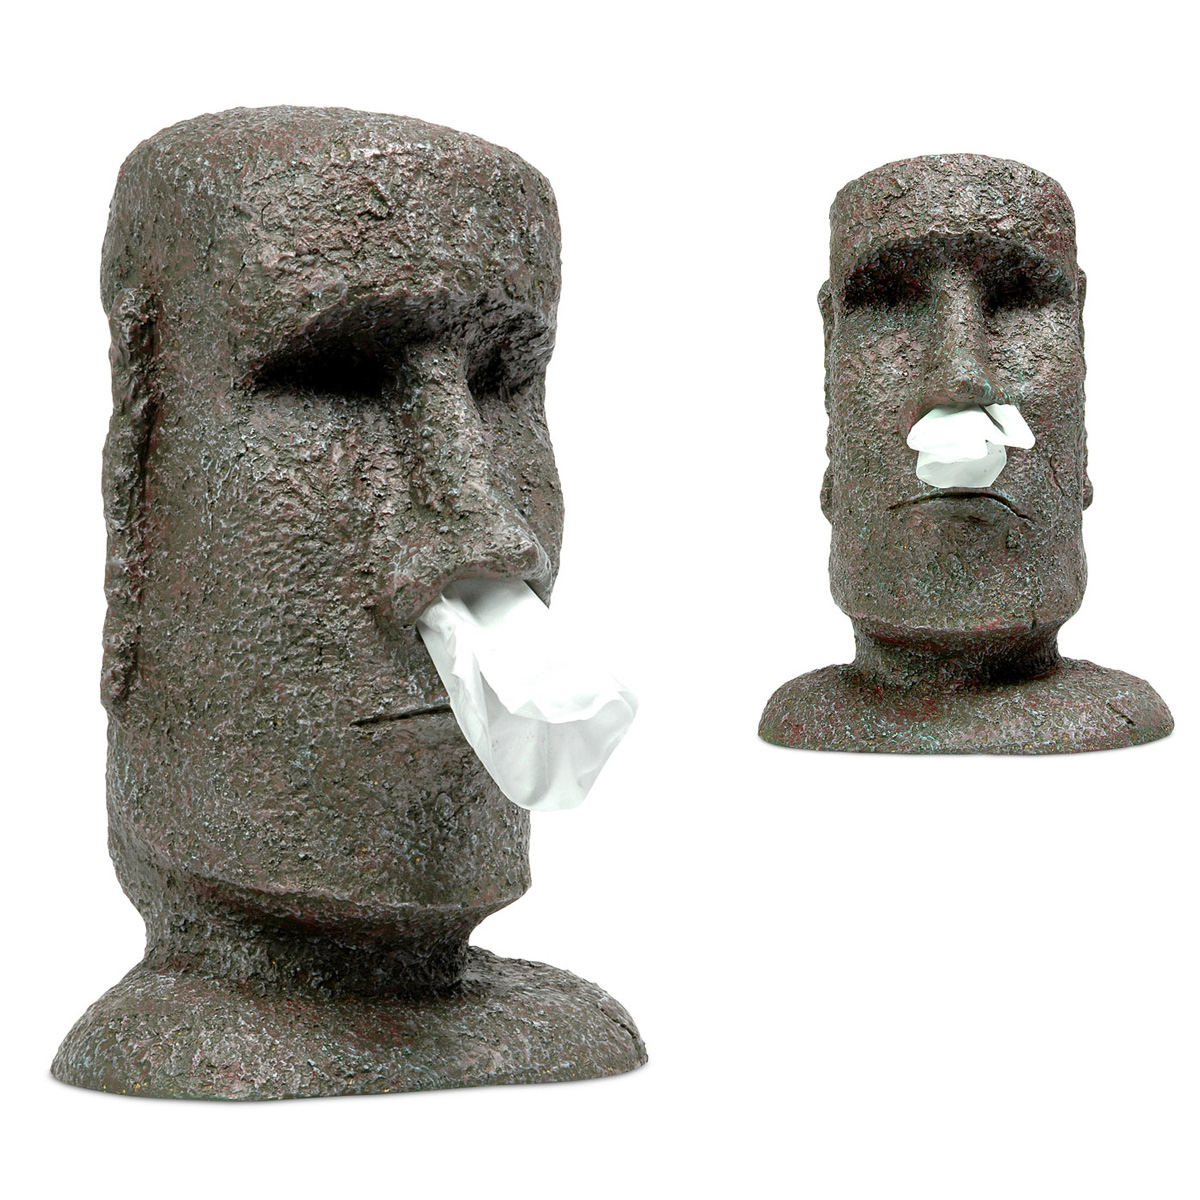 Habitat mukus, hidung!